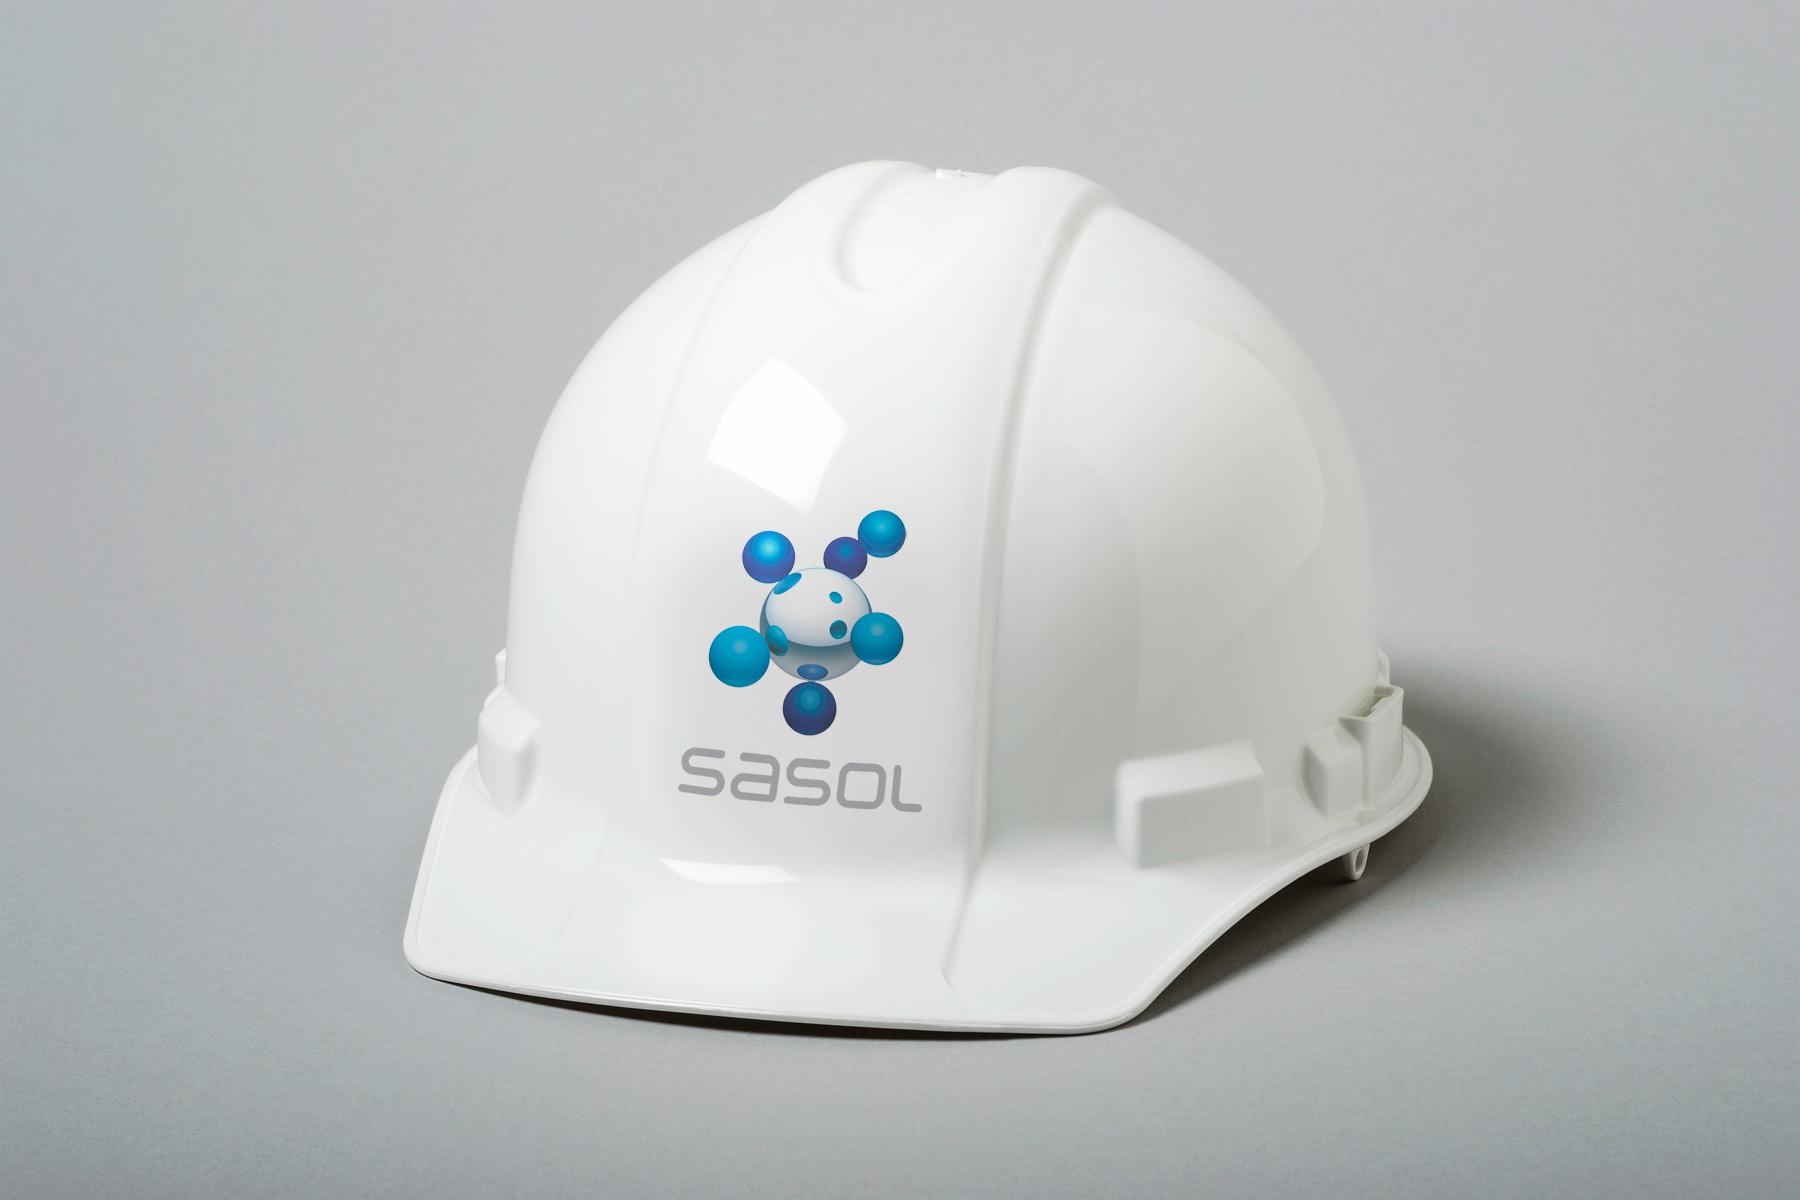 sasol_004